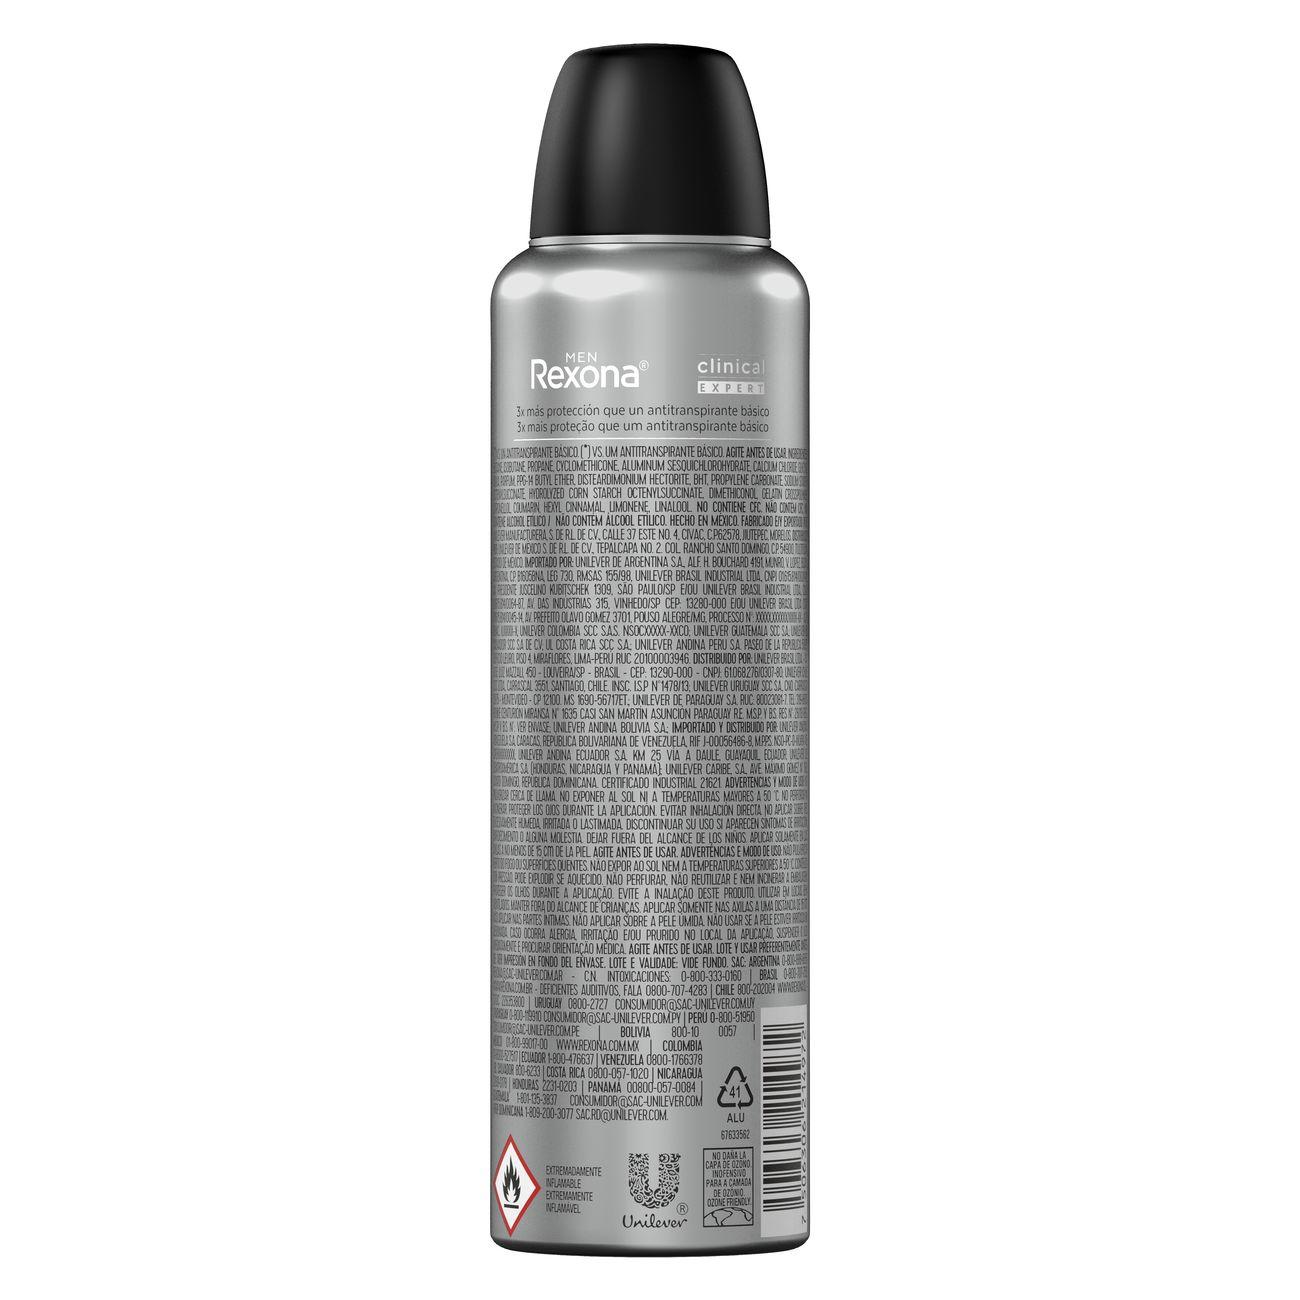 Desodorante Aerosol Rexona Clinical Masculino Clean 91g